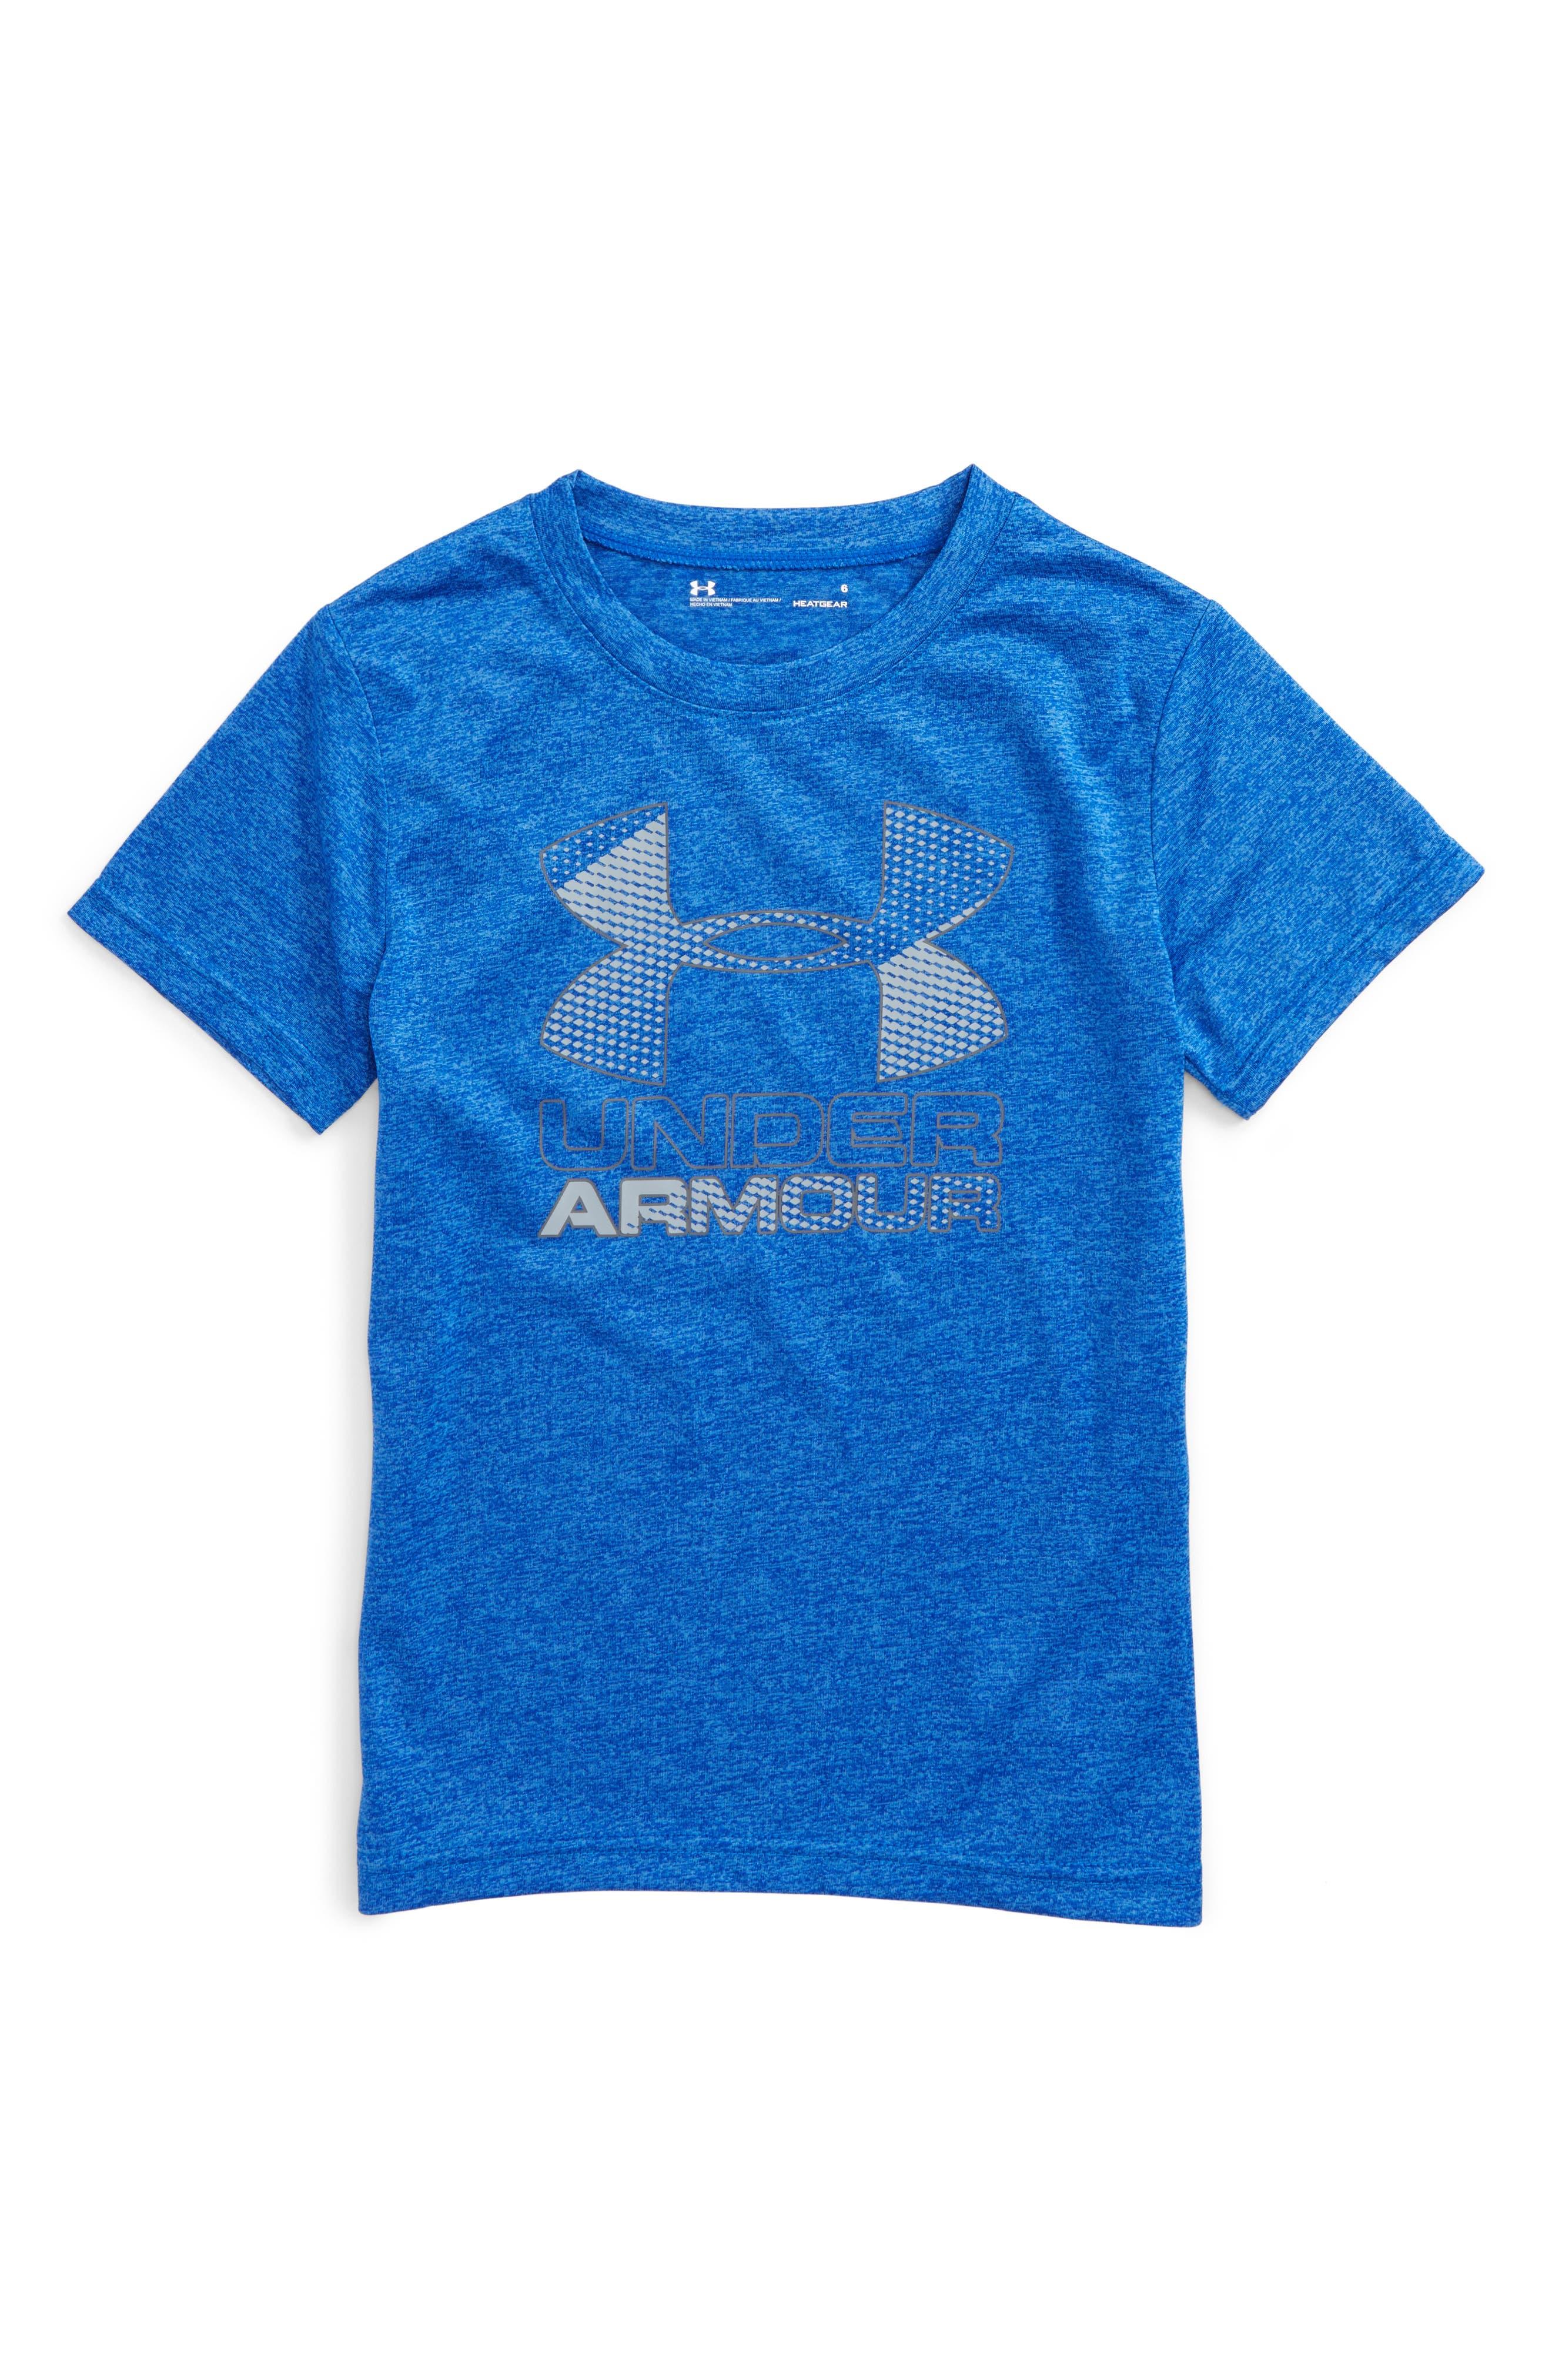 Under Armour Big Logo HeatGear® T-Shirt (Toddler Boys & Little Boys)